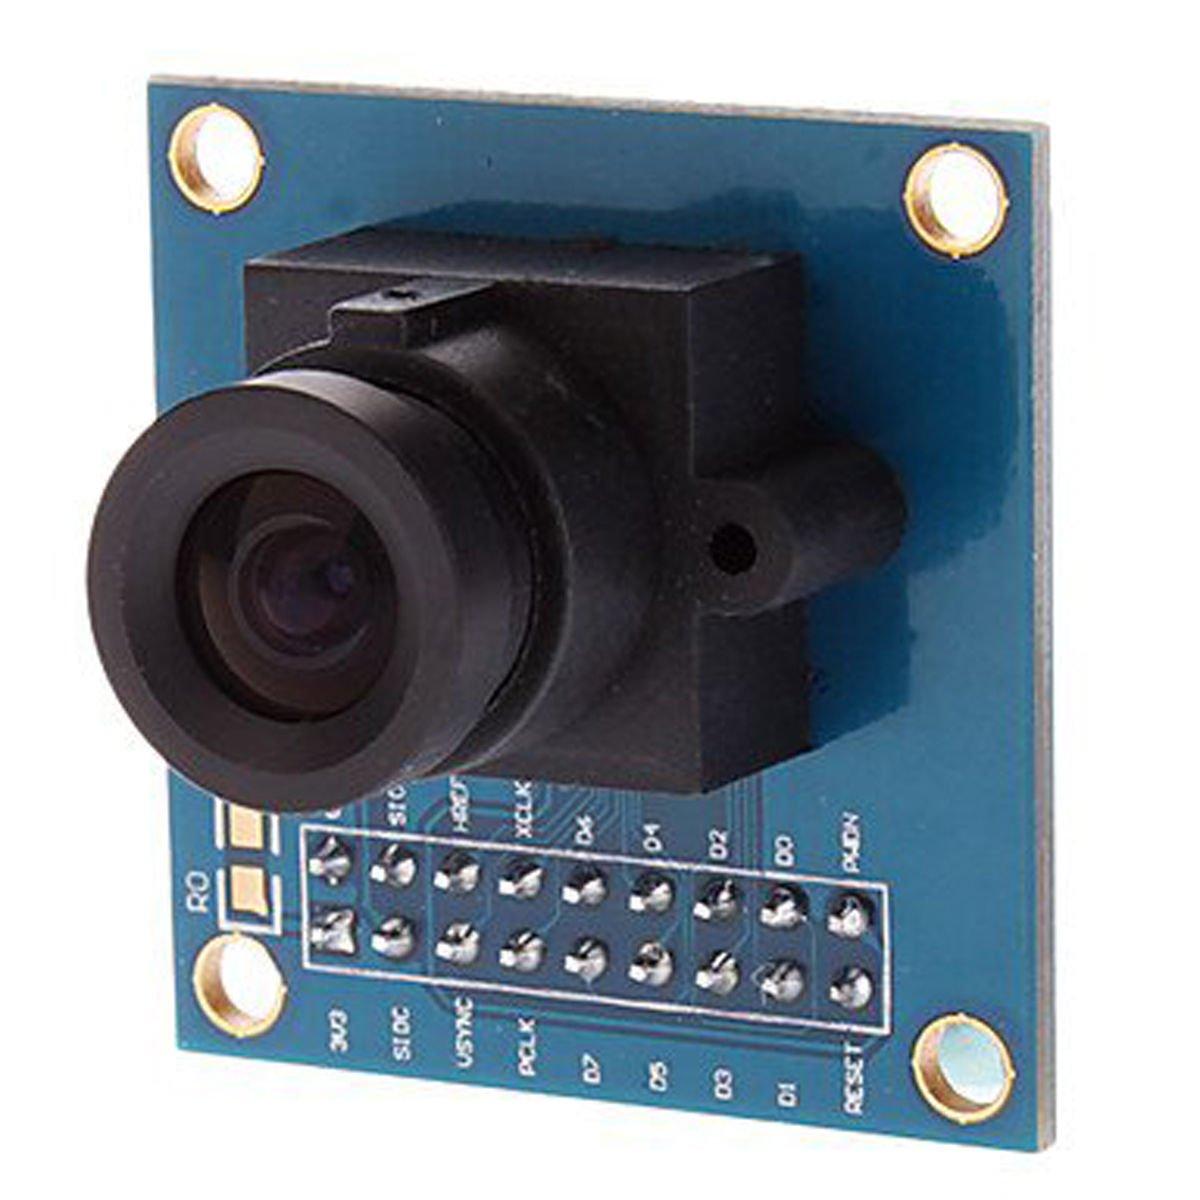 OV7670 300KP VGA Camera Module for Arduino - Work With Official Arduino Board(261583153496)